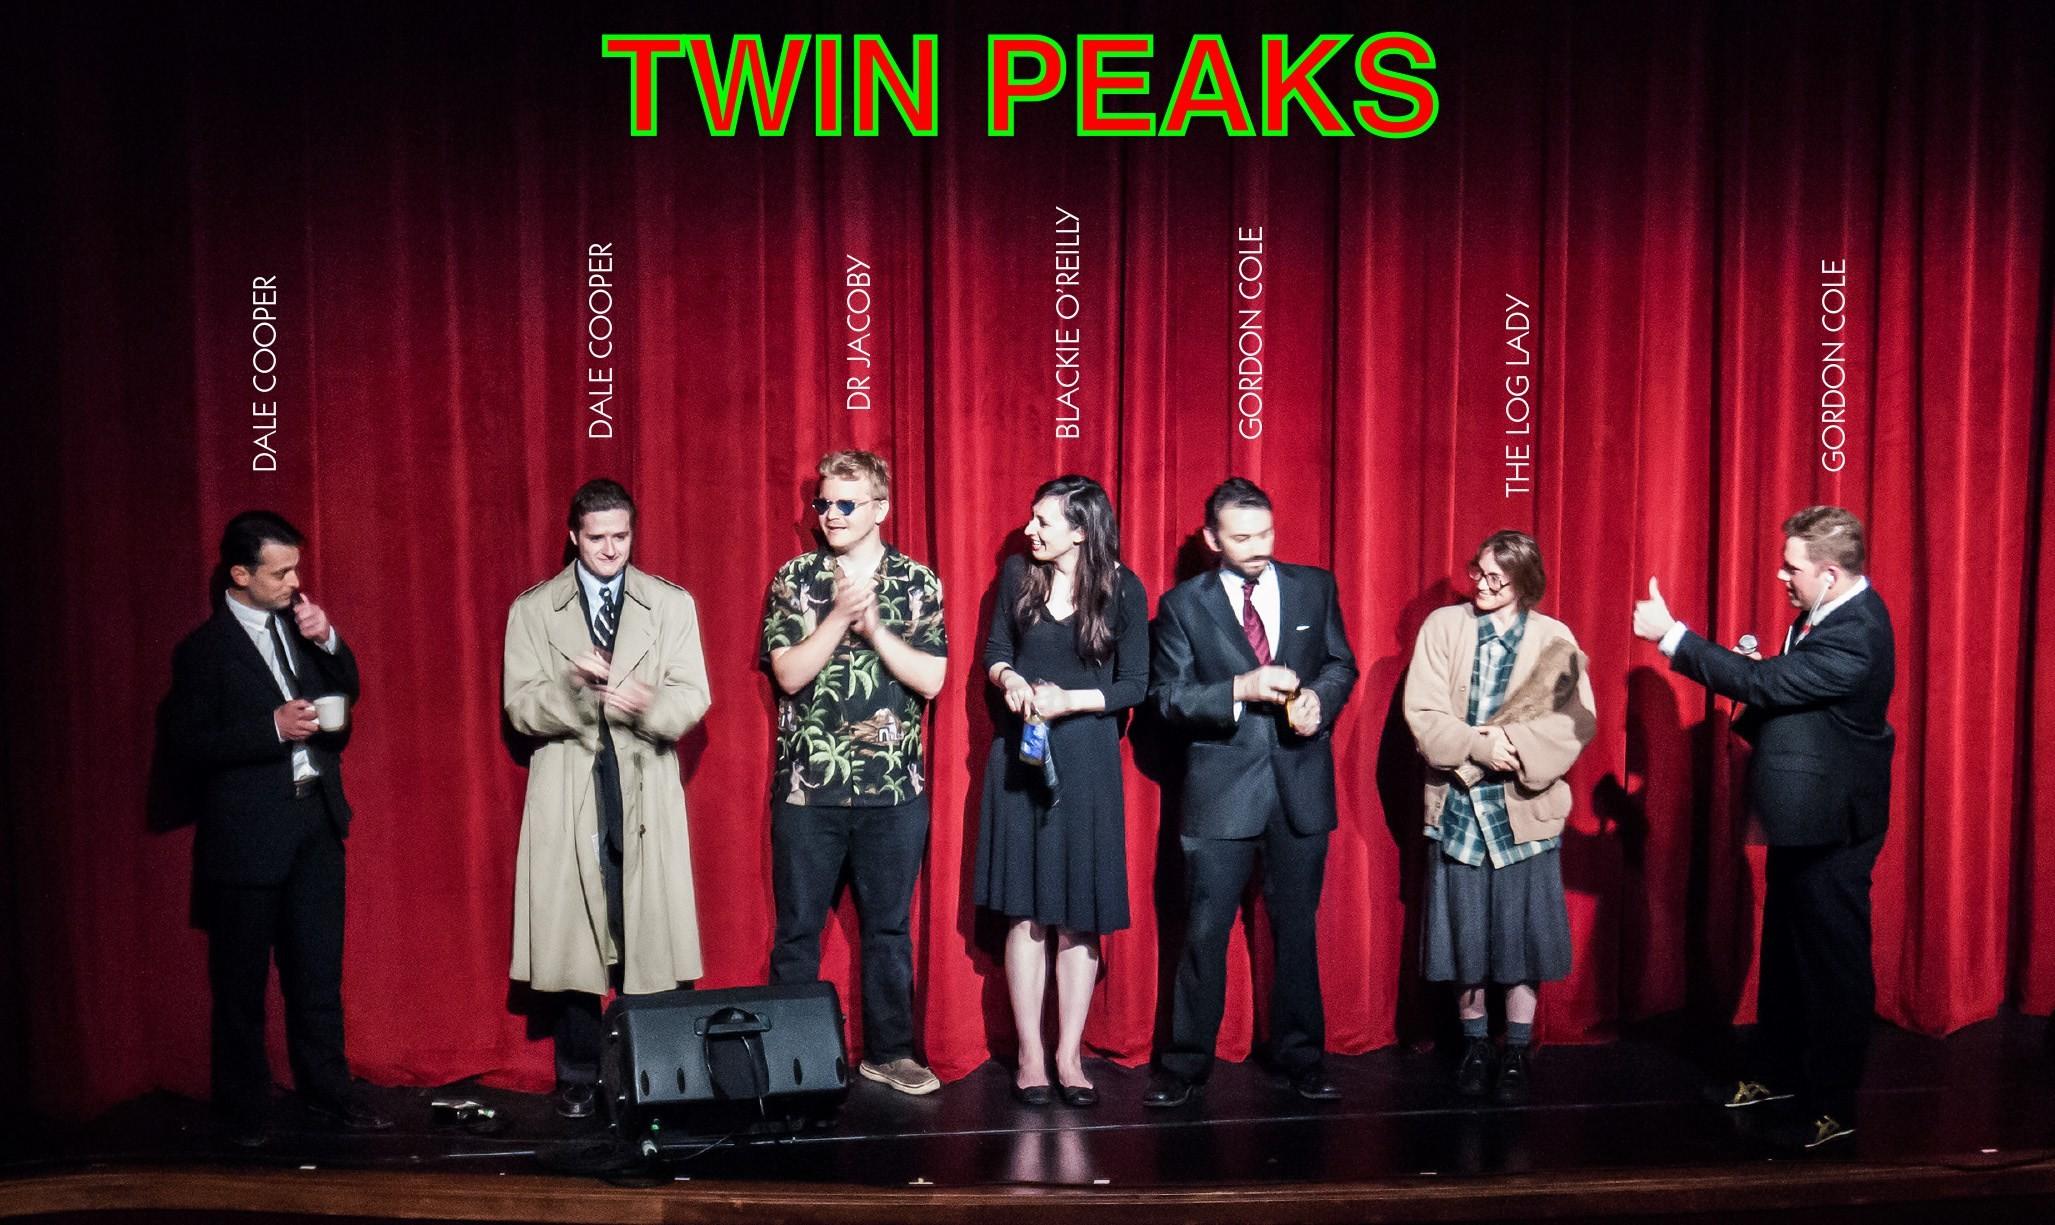 twin peaks phone wallpaper …